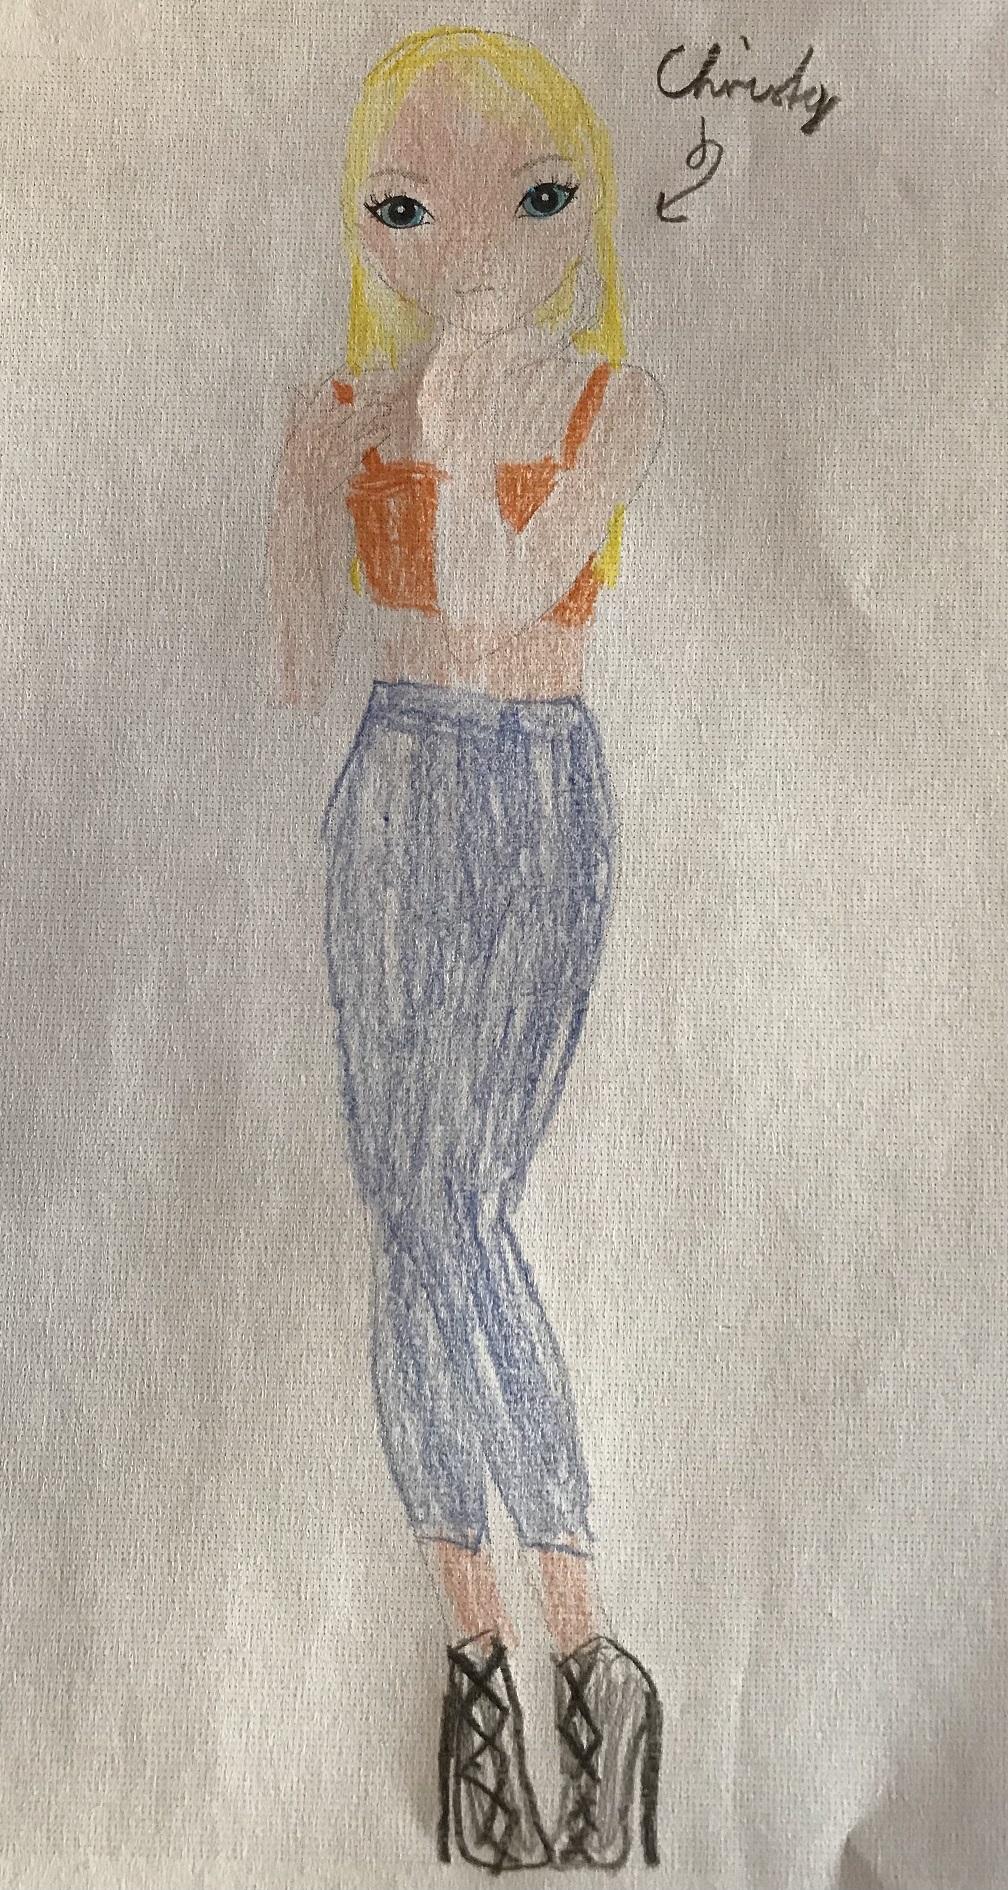 Antonia W., 8 Jahre, aus Ebern